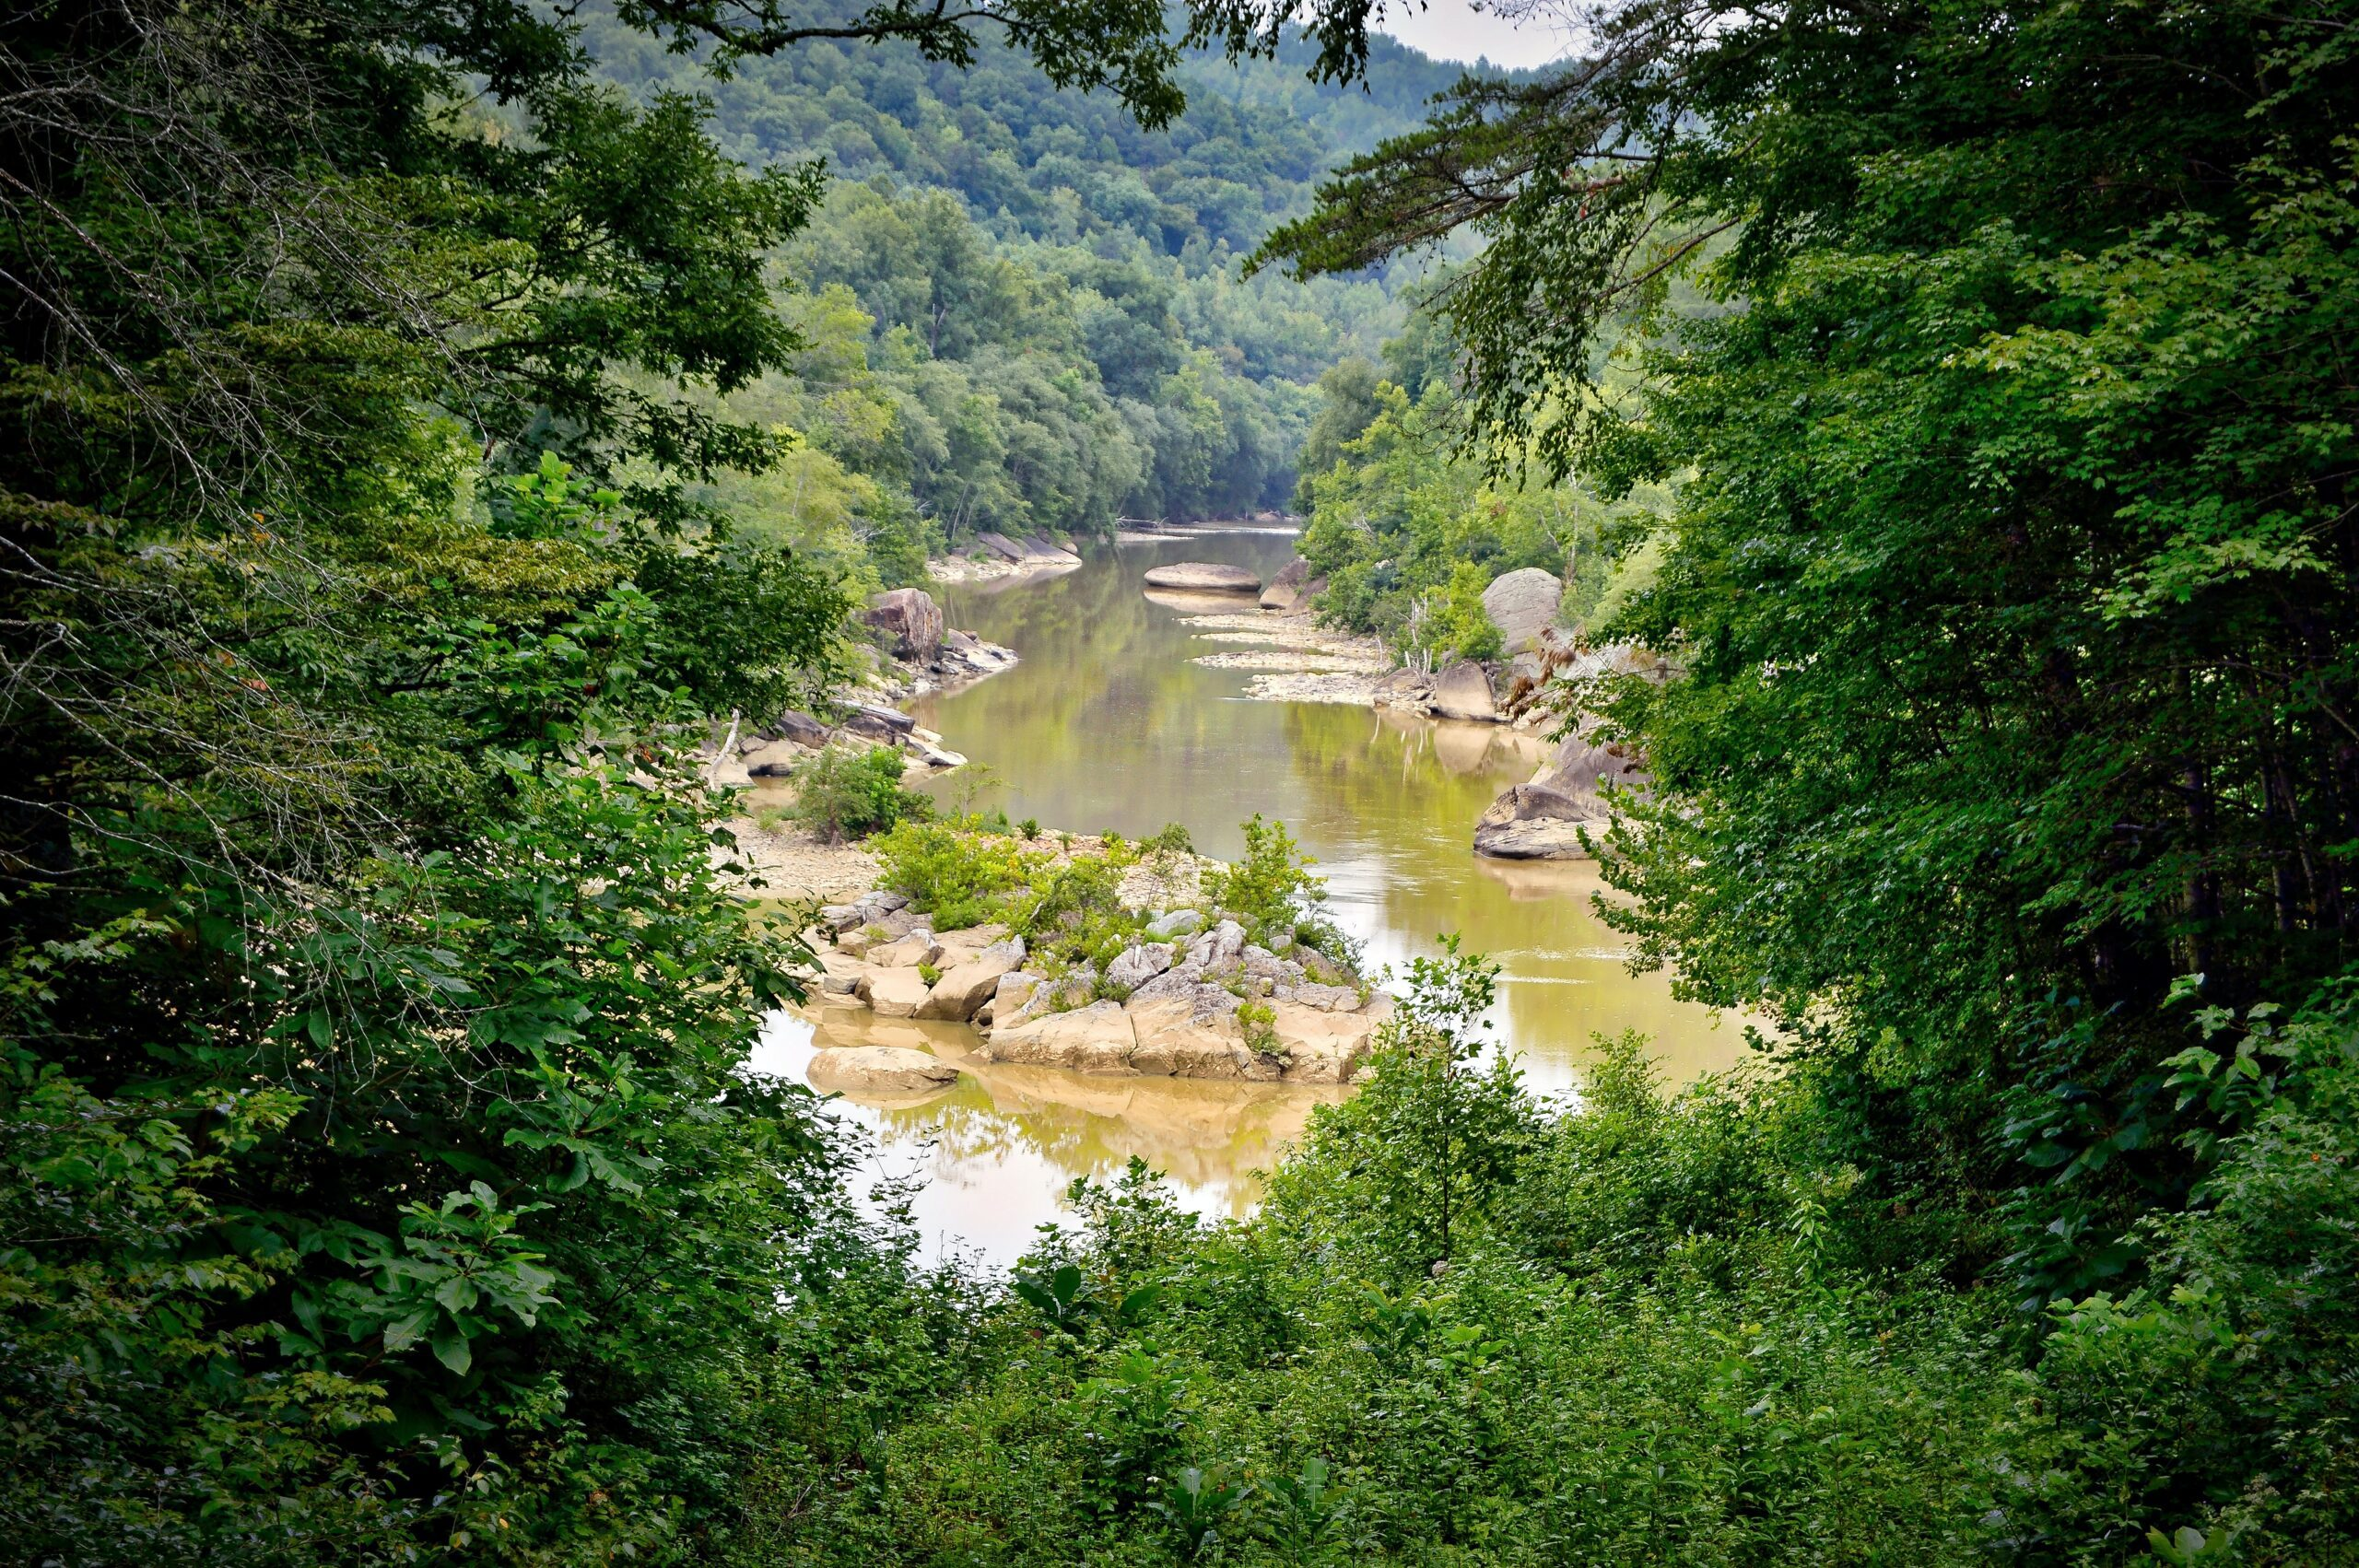 william-phipps-Kentucky creek-unsplash